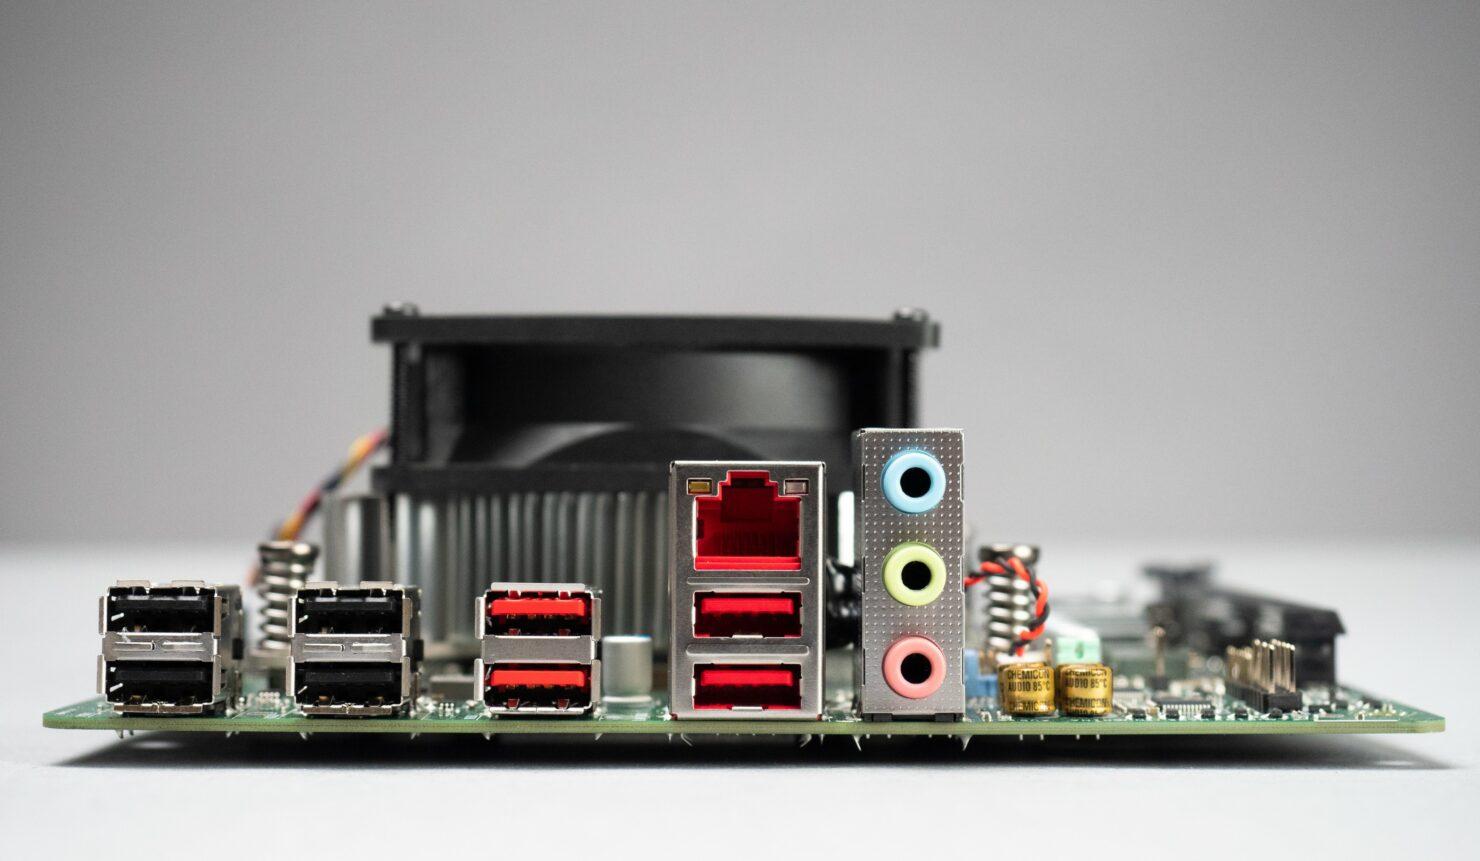 amd-4700s-desktop-pc-kit-xbox-series-x-apu_3